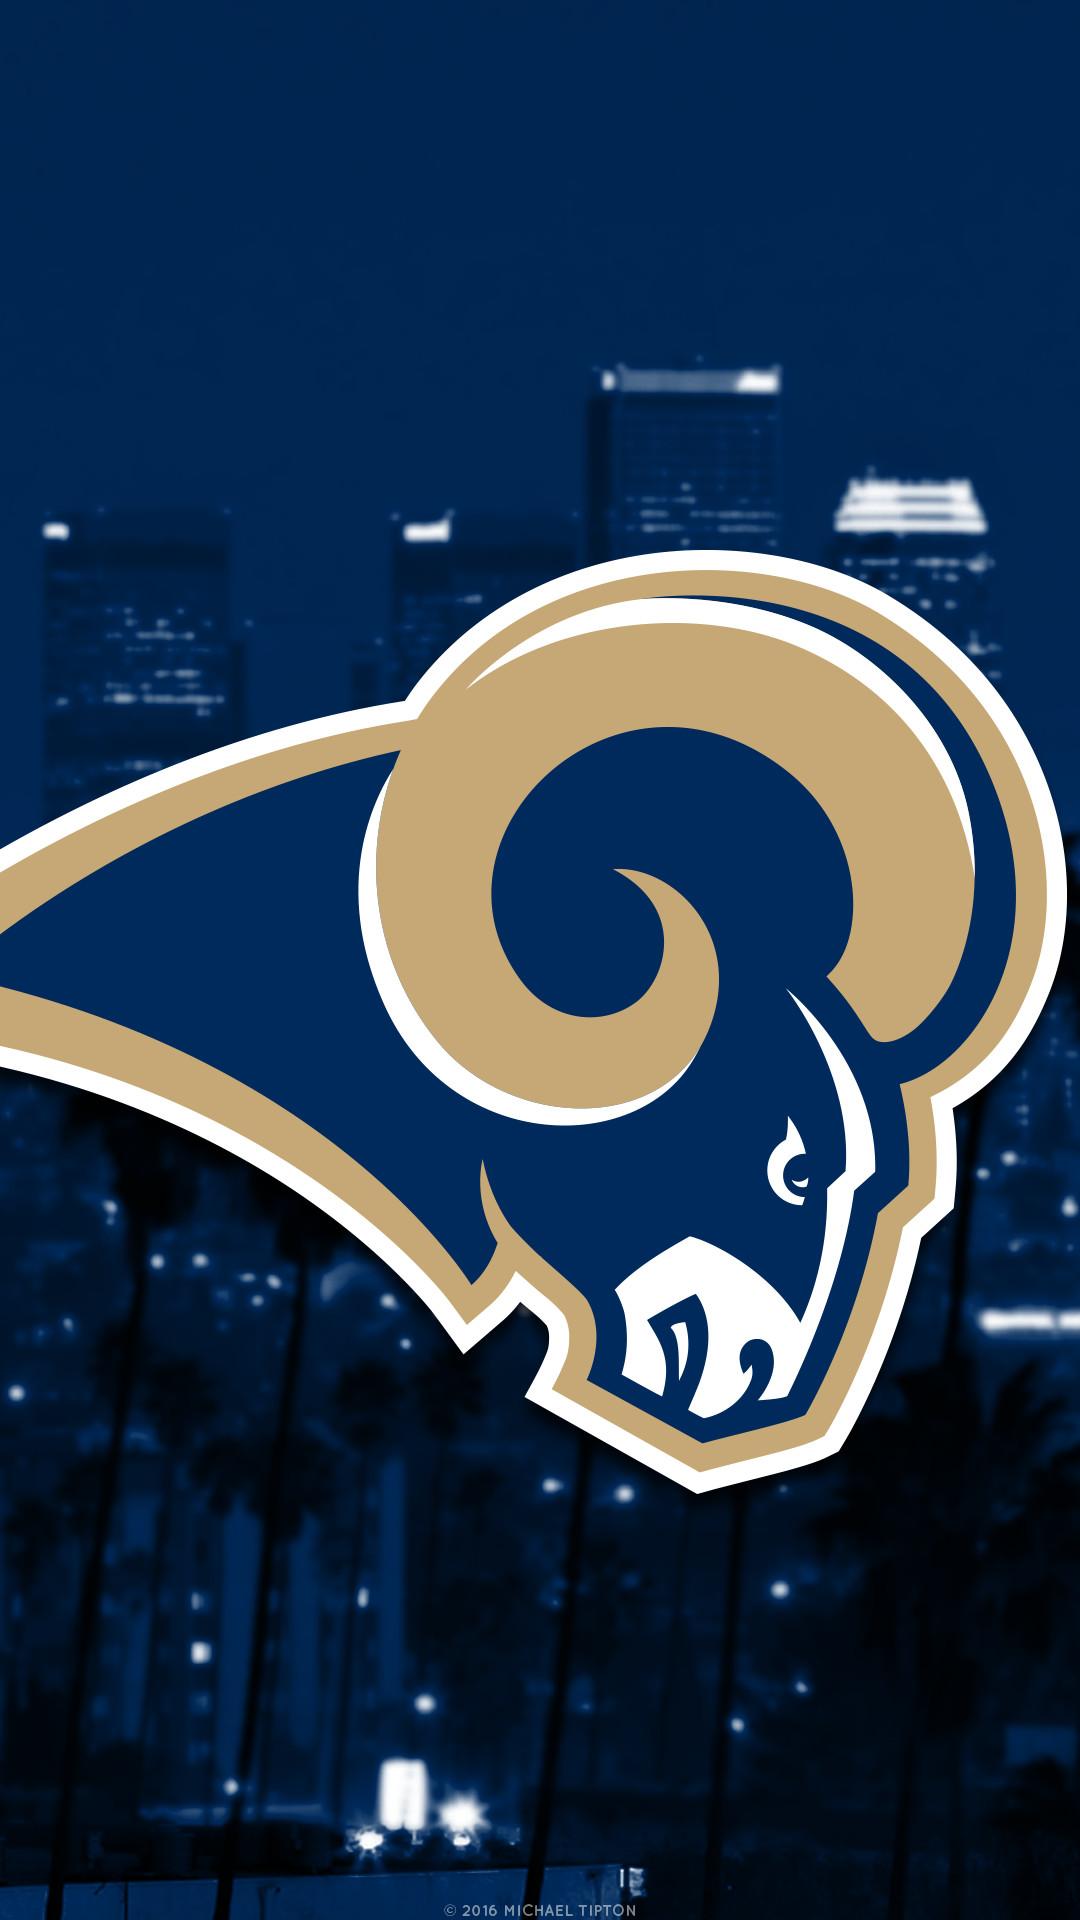 … Los Angeles Rams city 2017 logo wallpaper free iphone 5, 6, 7, galaxy